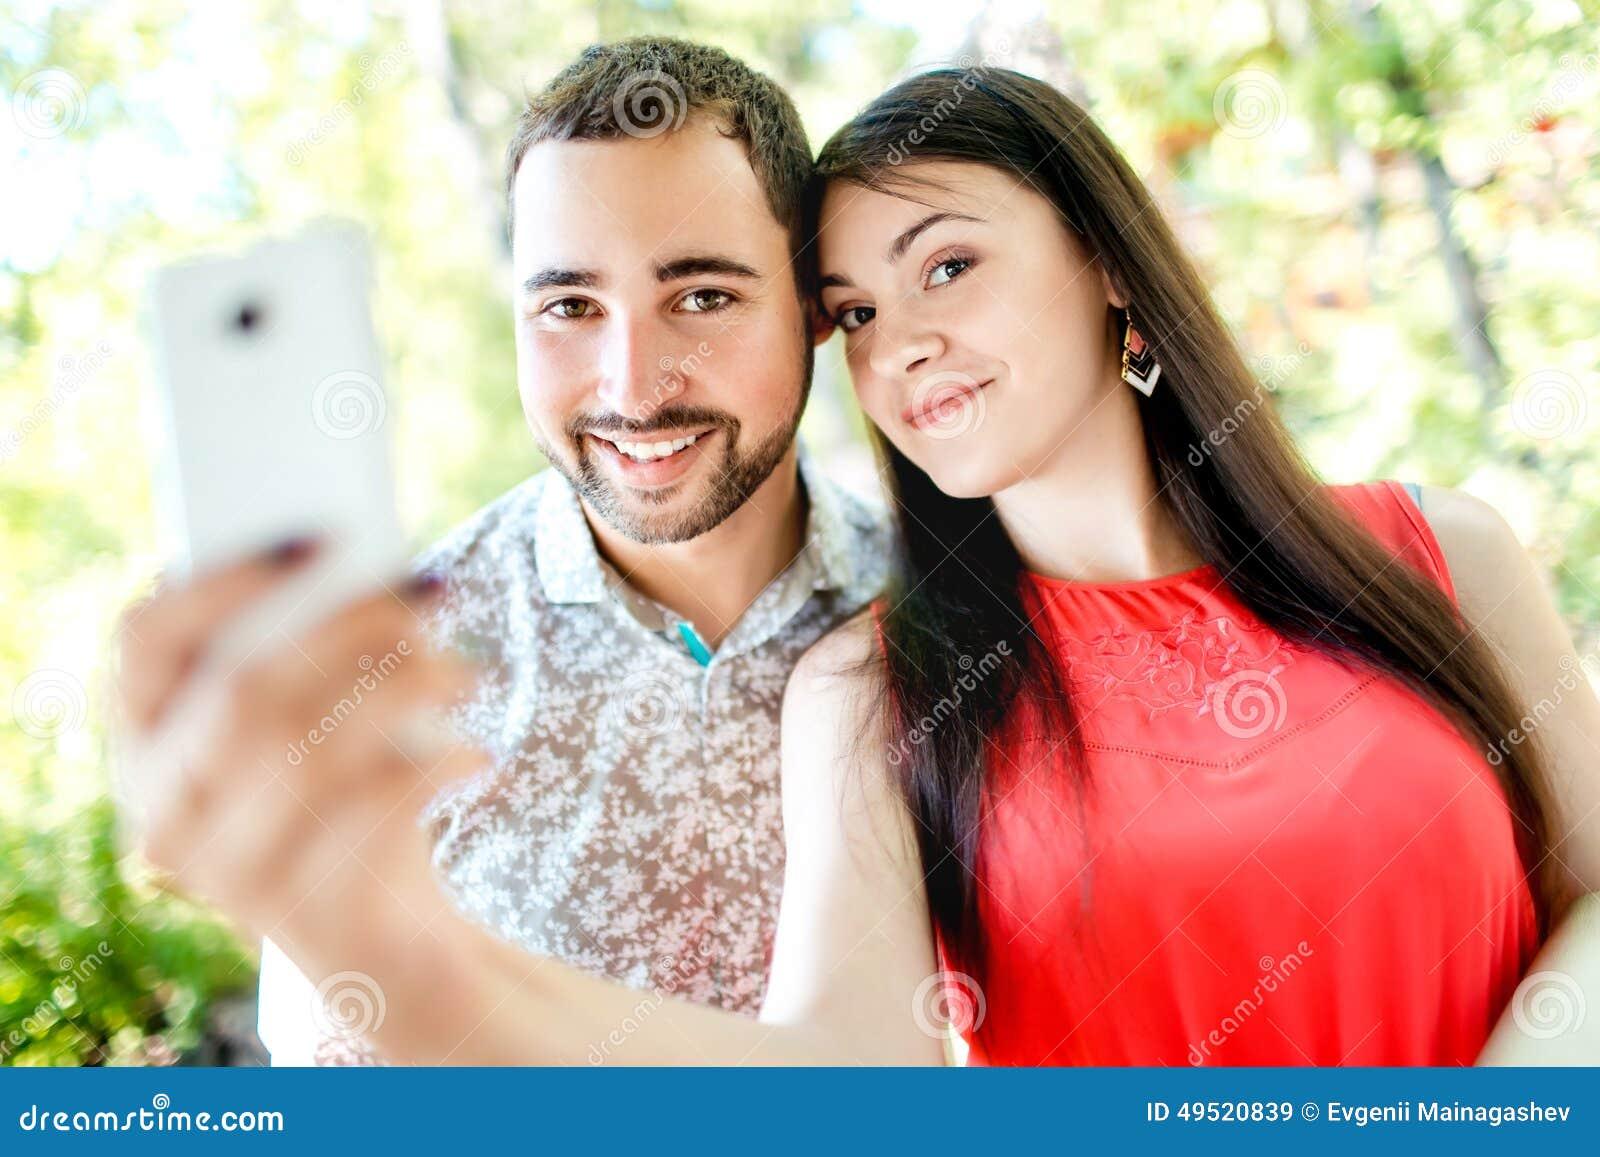 Self dating